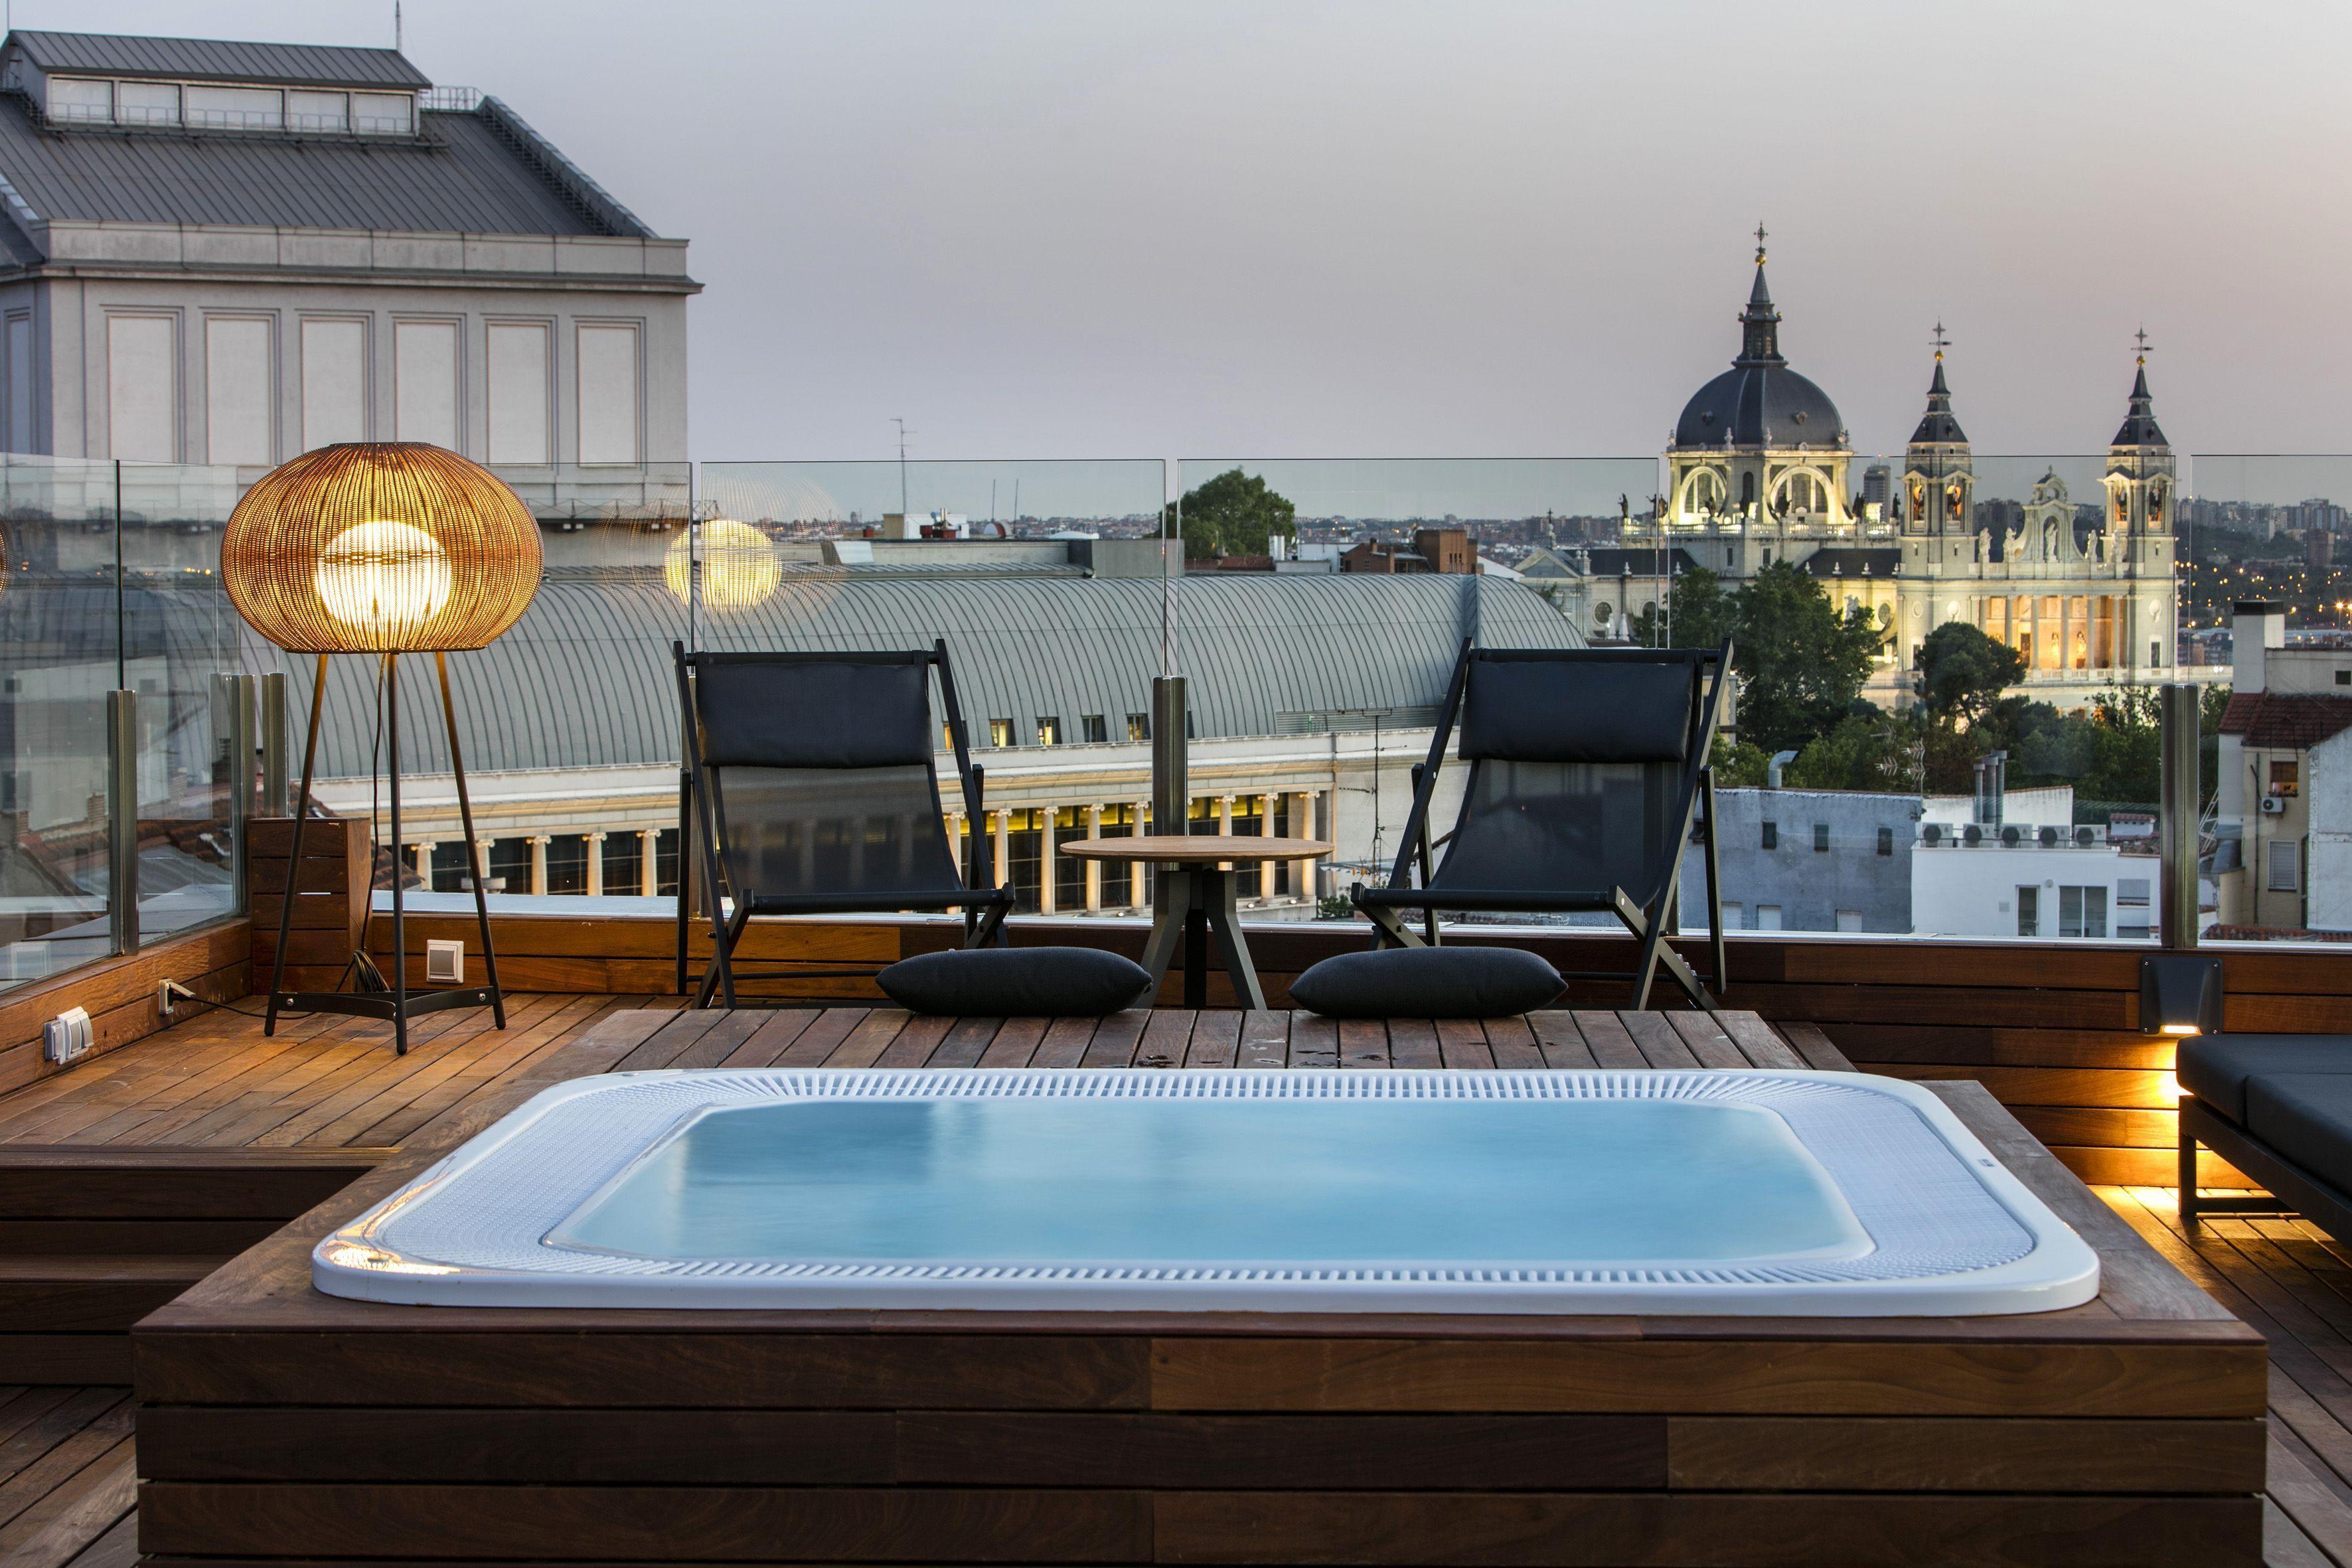 Mejores hoteles con piscina en madrid espa a en pareja - Hoteles con piscina climatizada en madrid ...